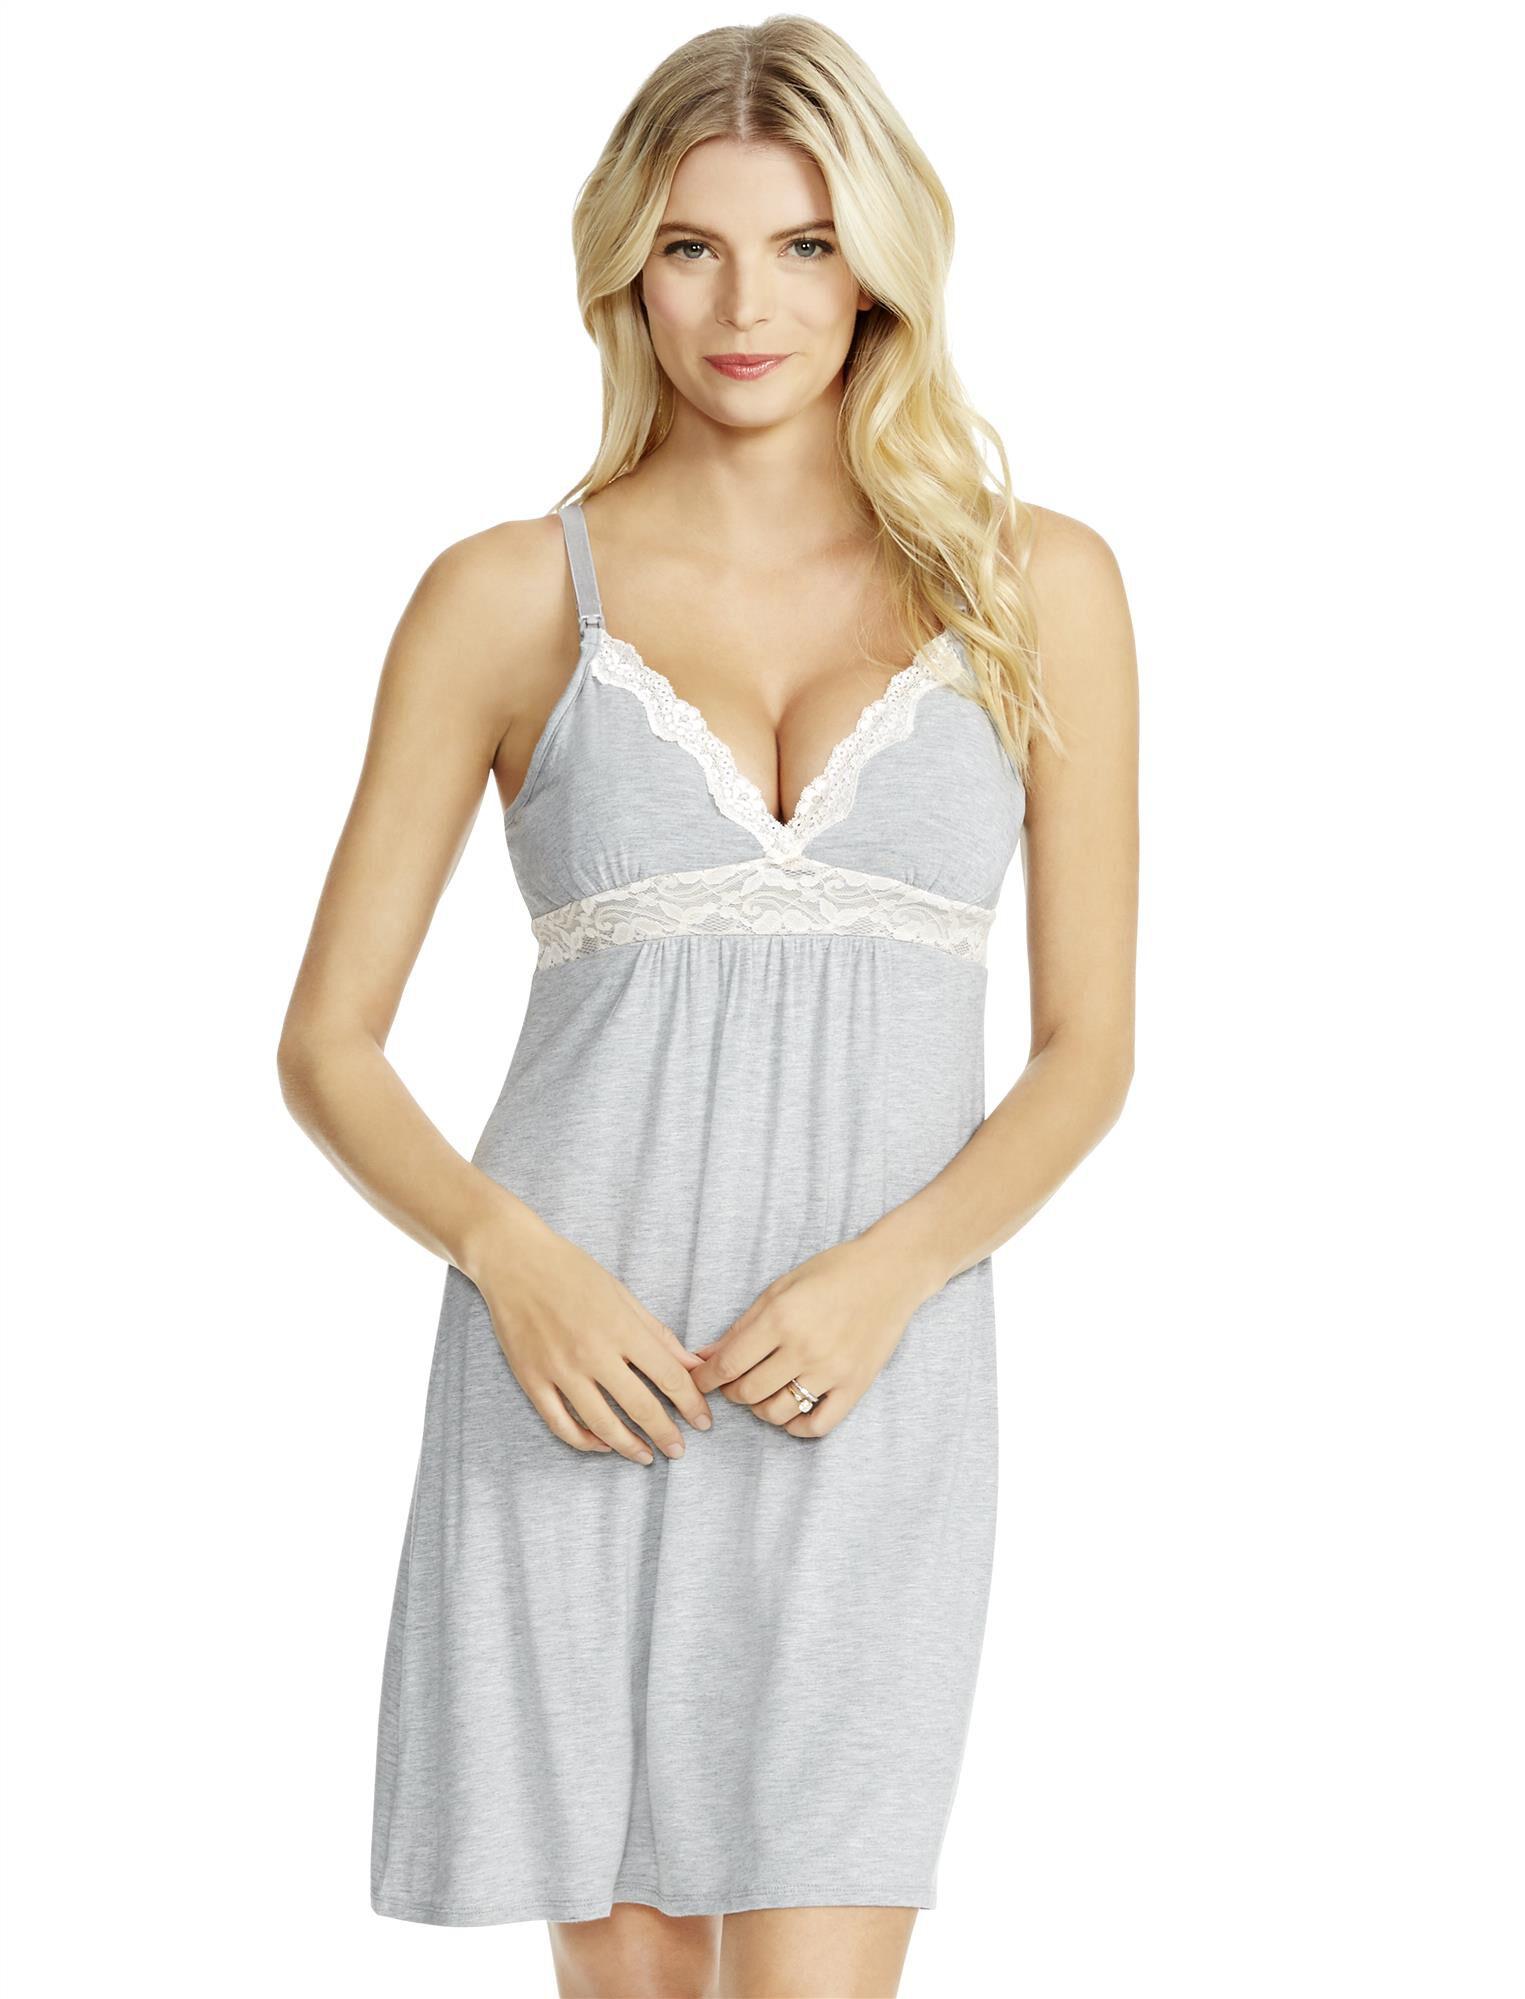 Jessica Simpson Lace Nursing Nightgown- Heather Grey